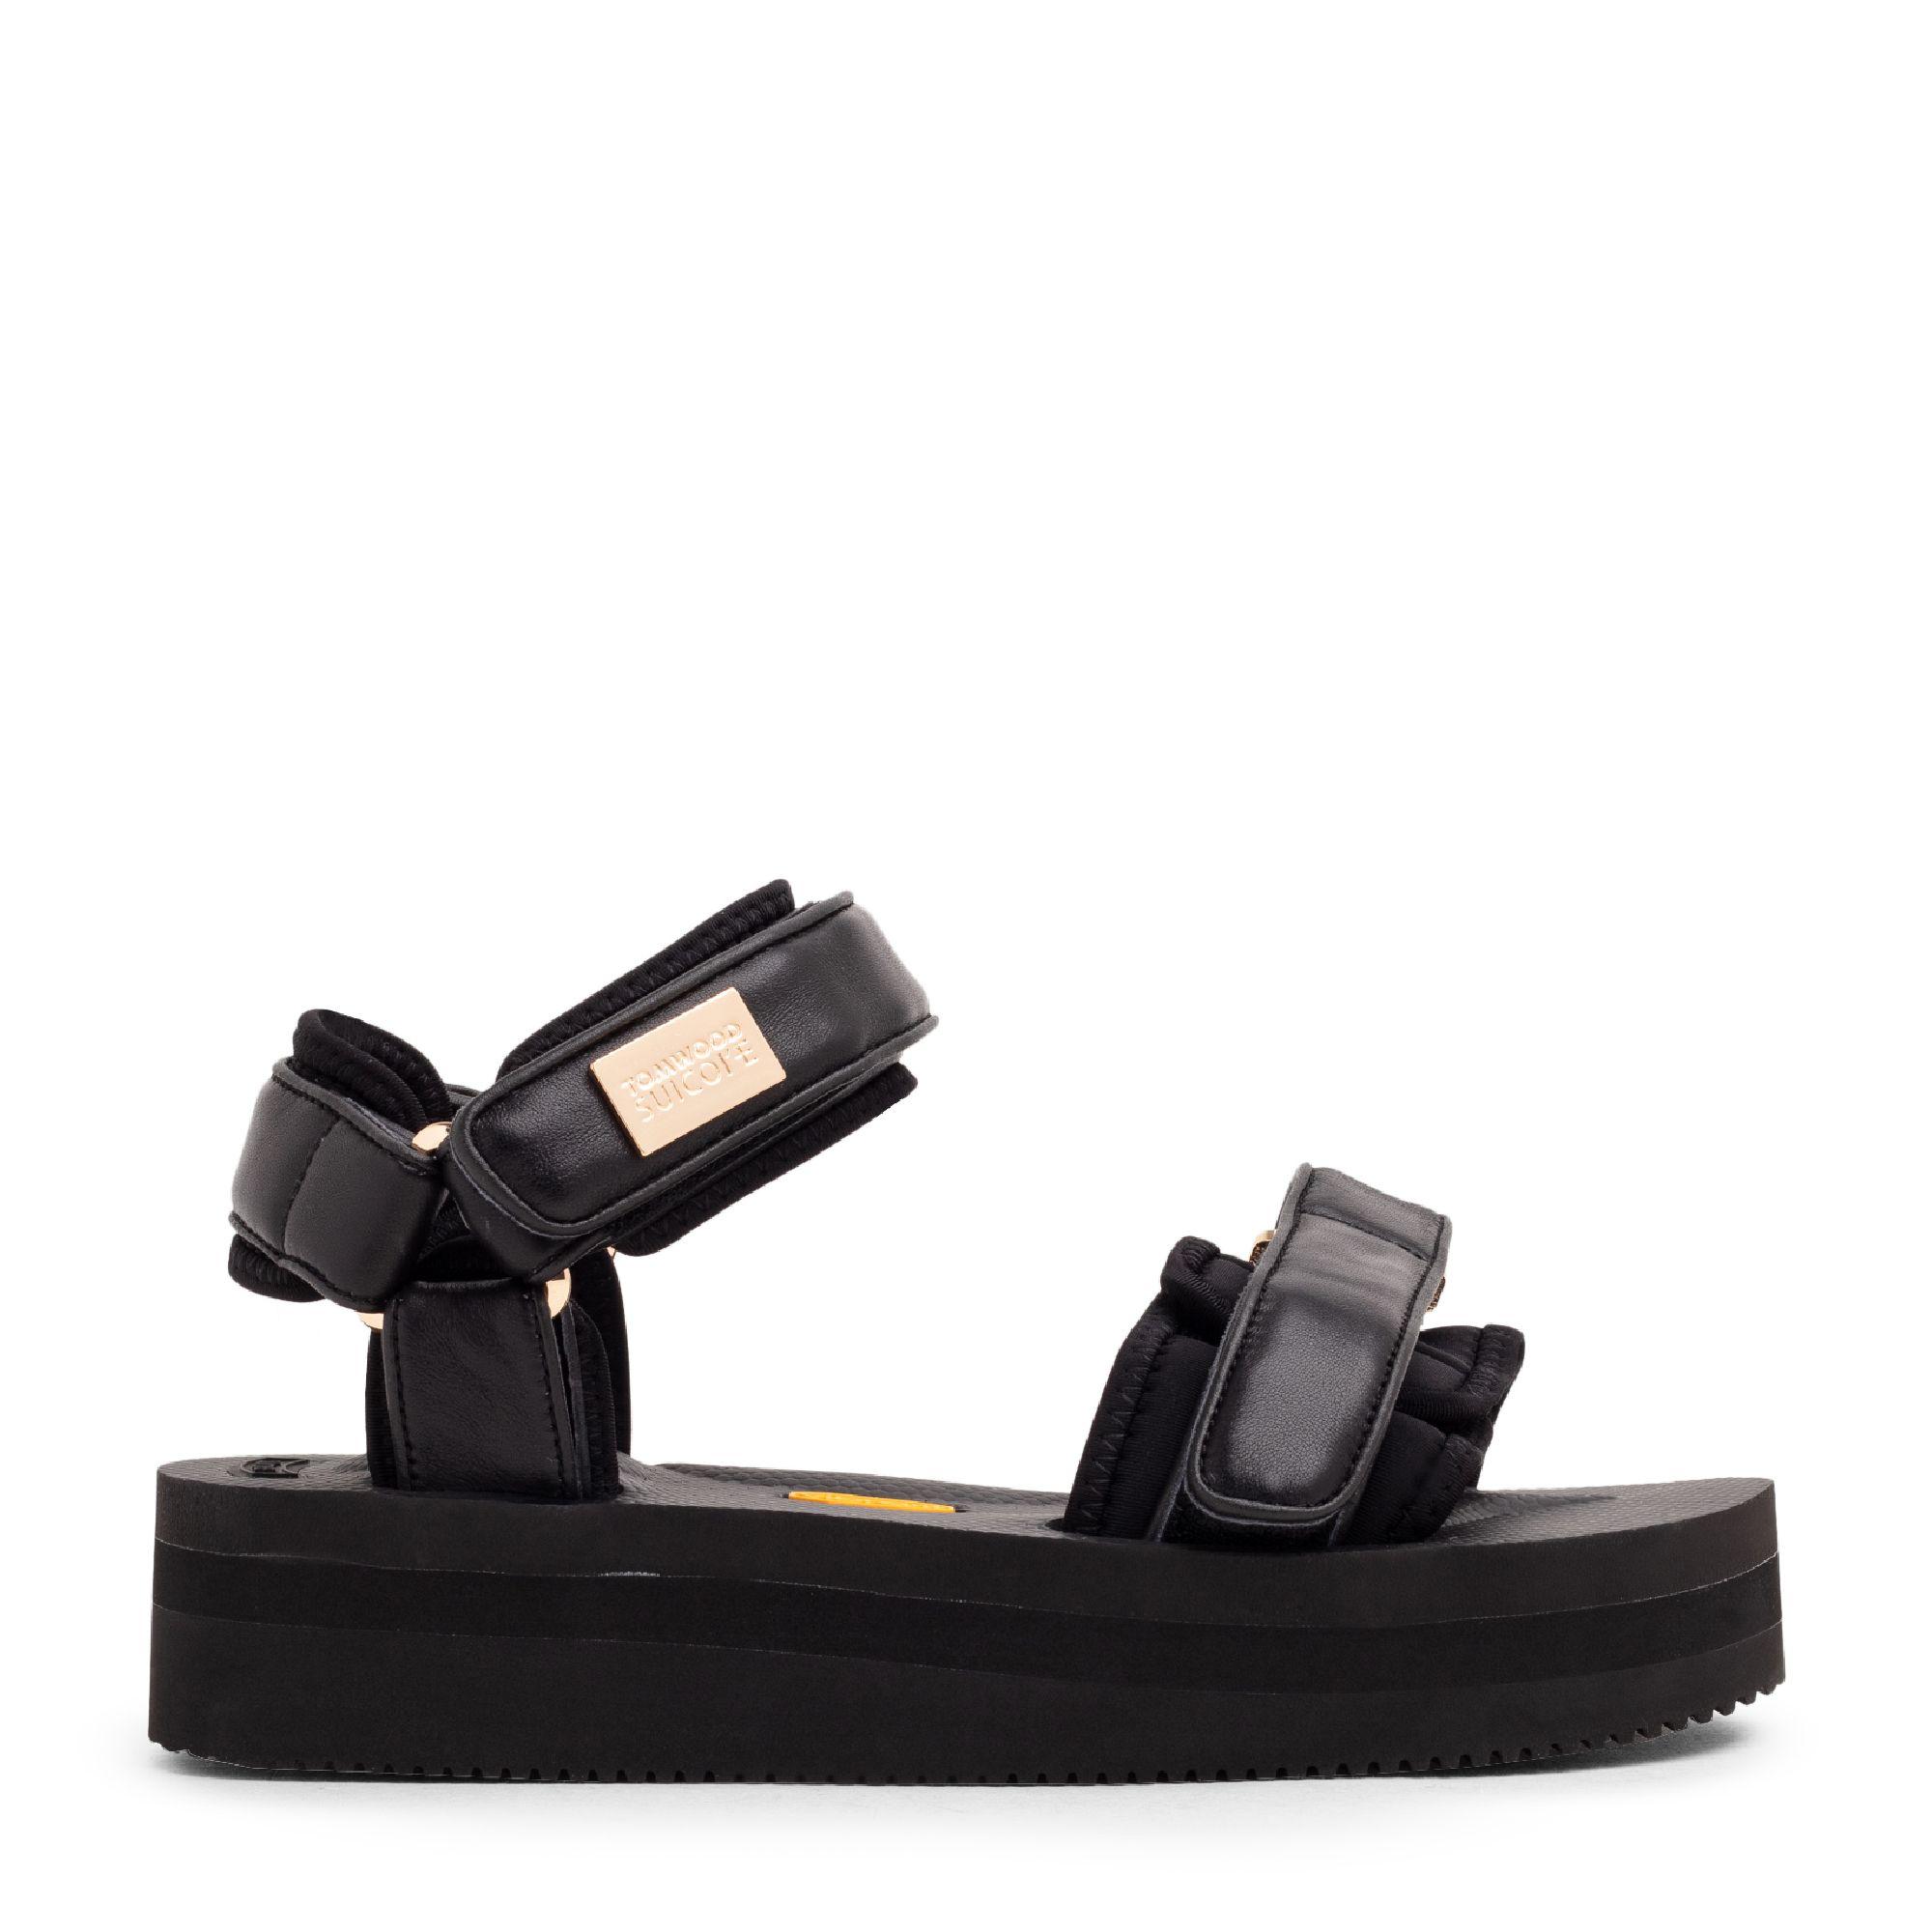 Cel-VPO sandals